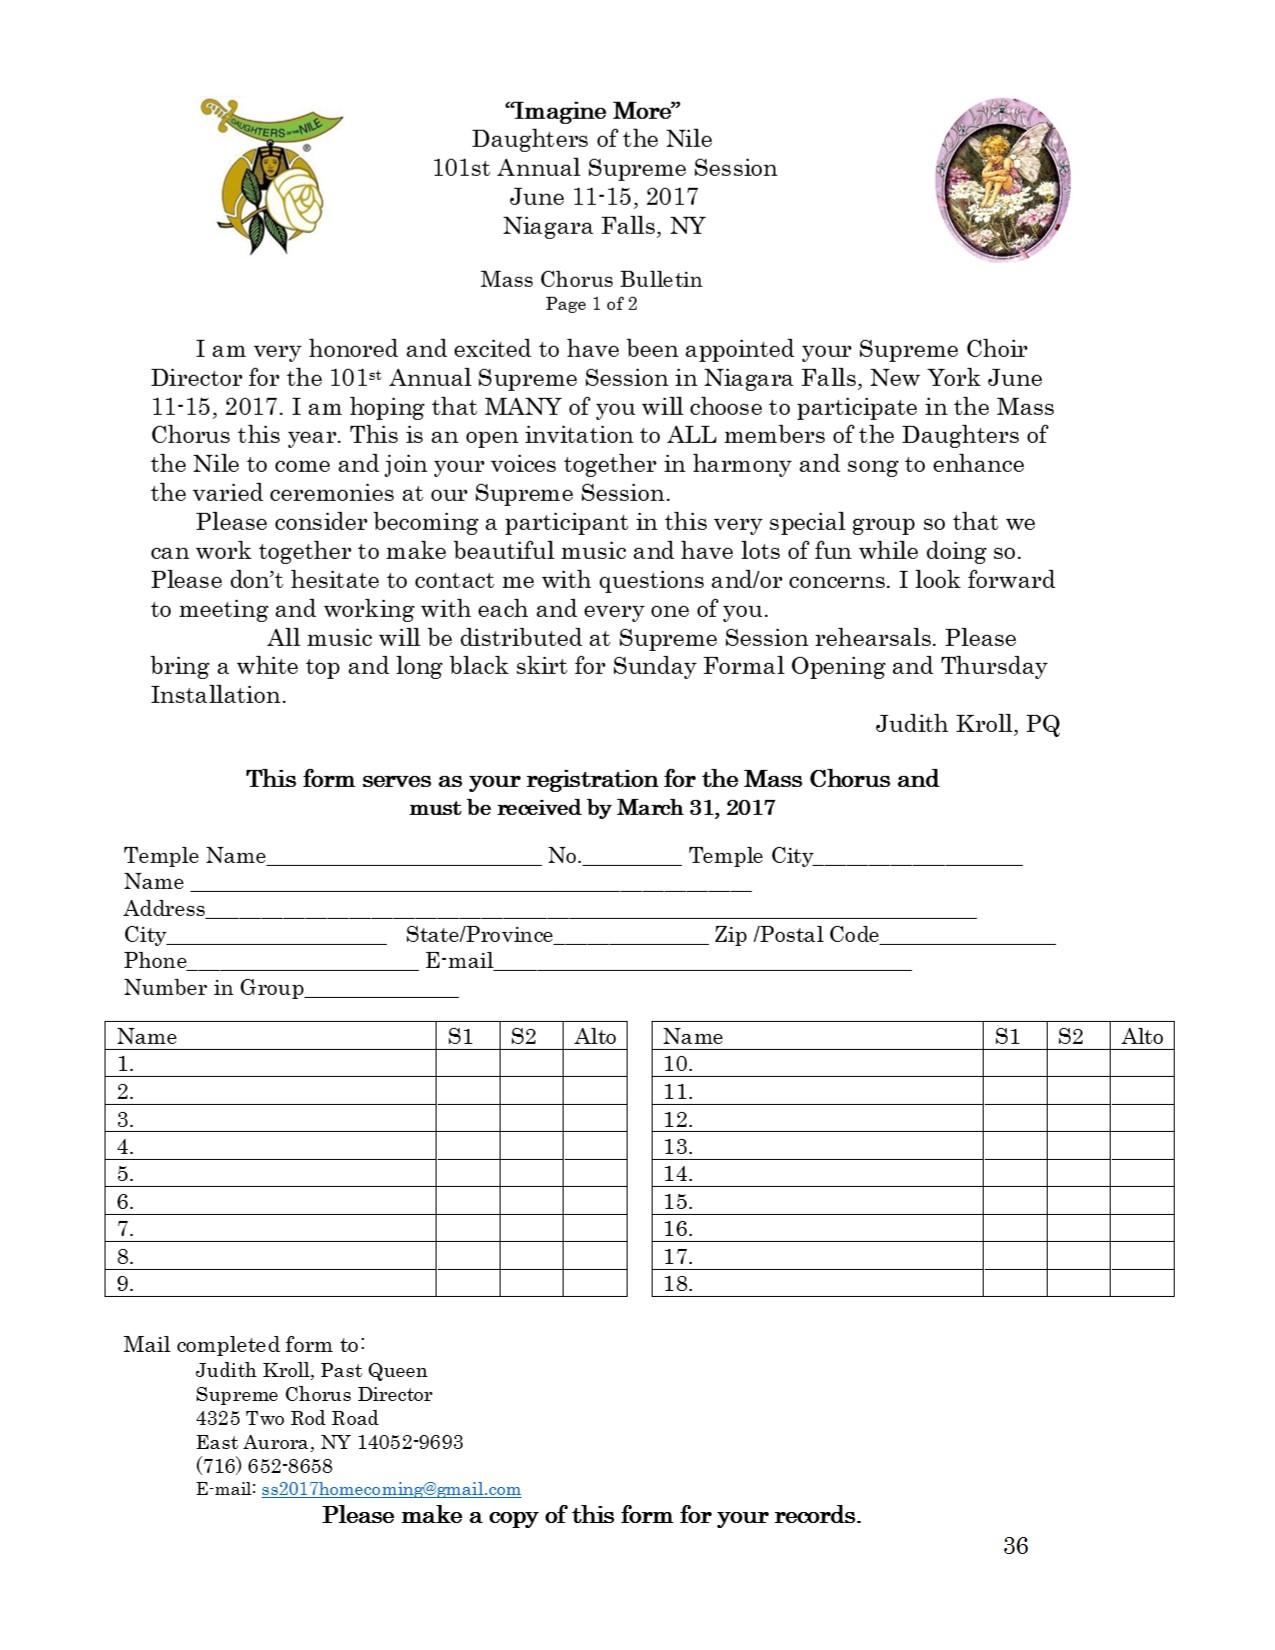 36 Mass Chorus Bulletin